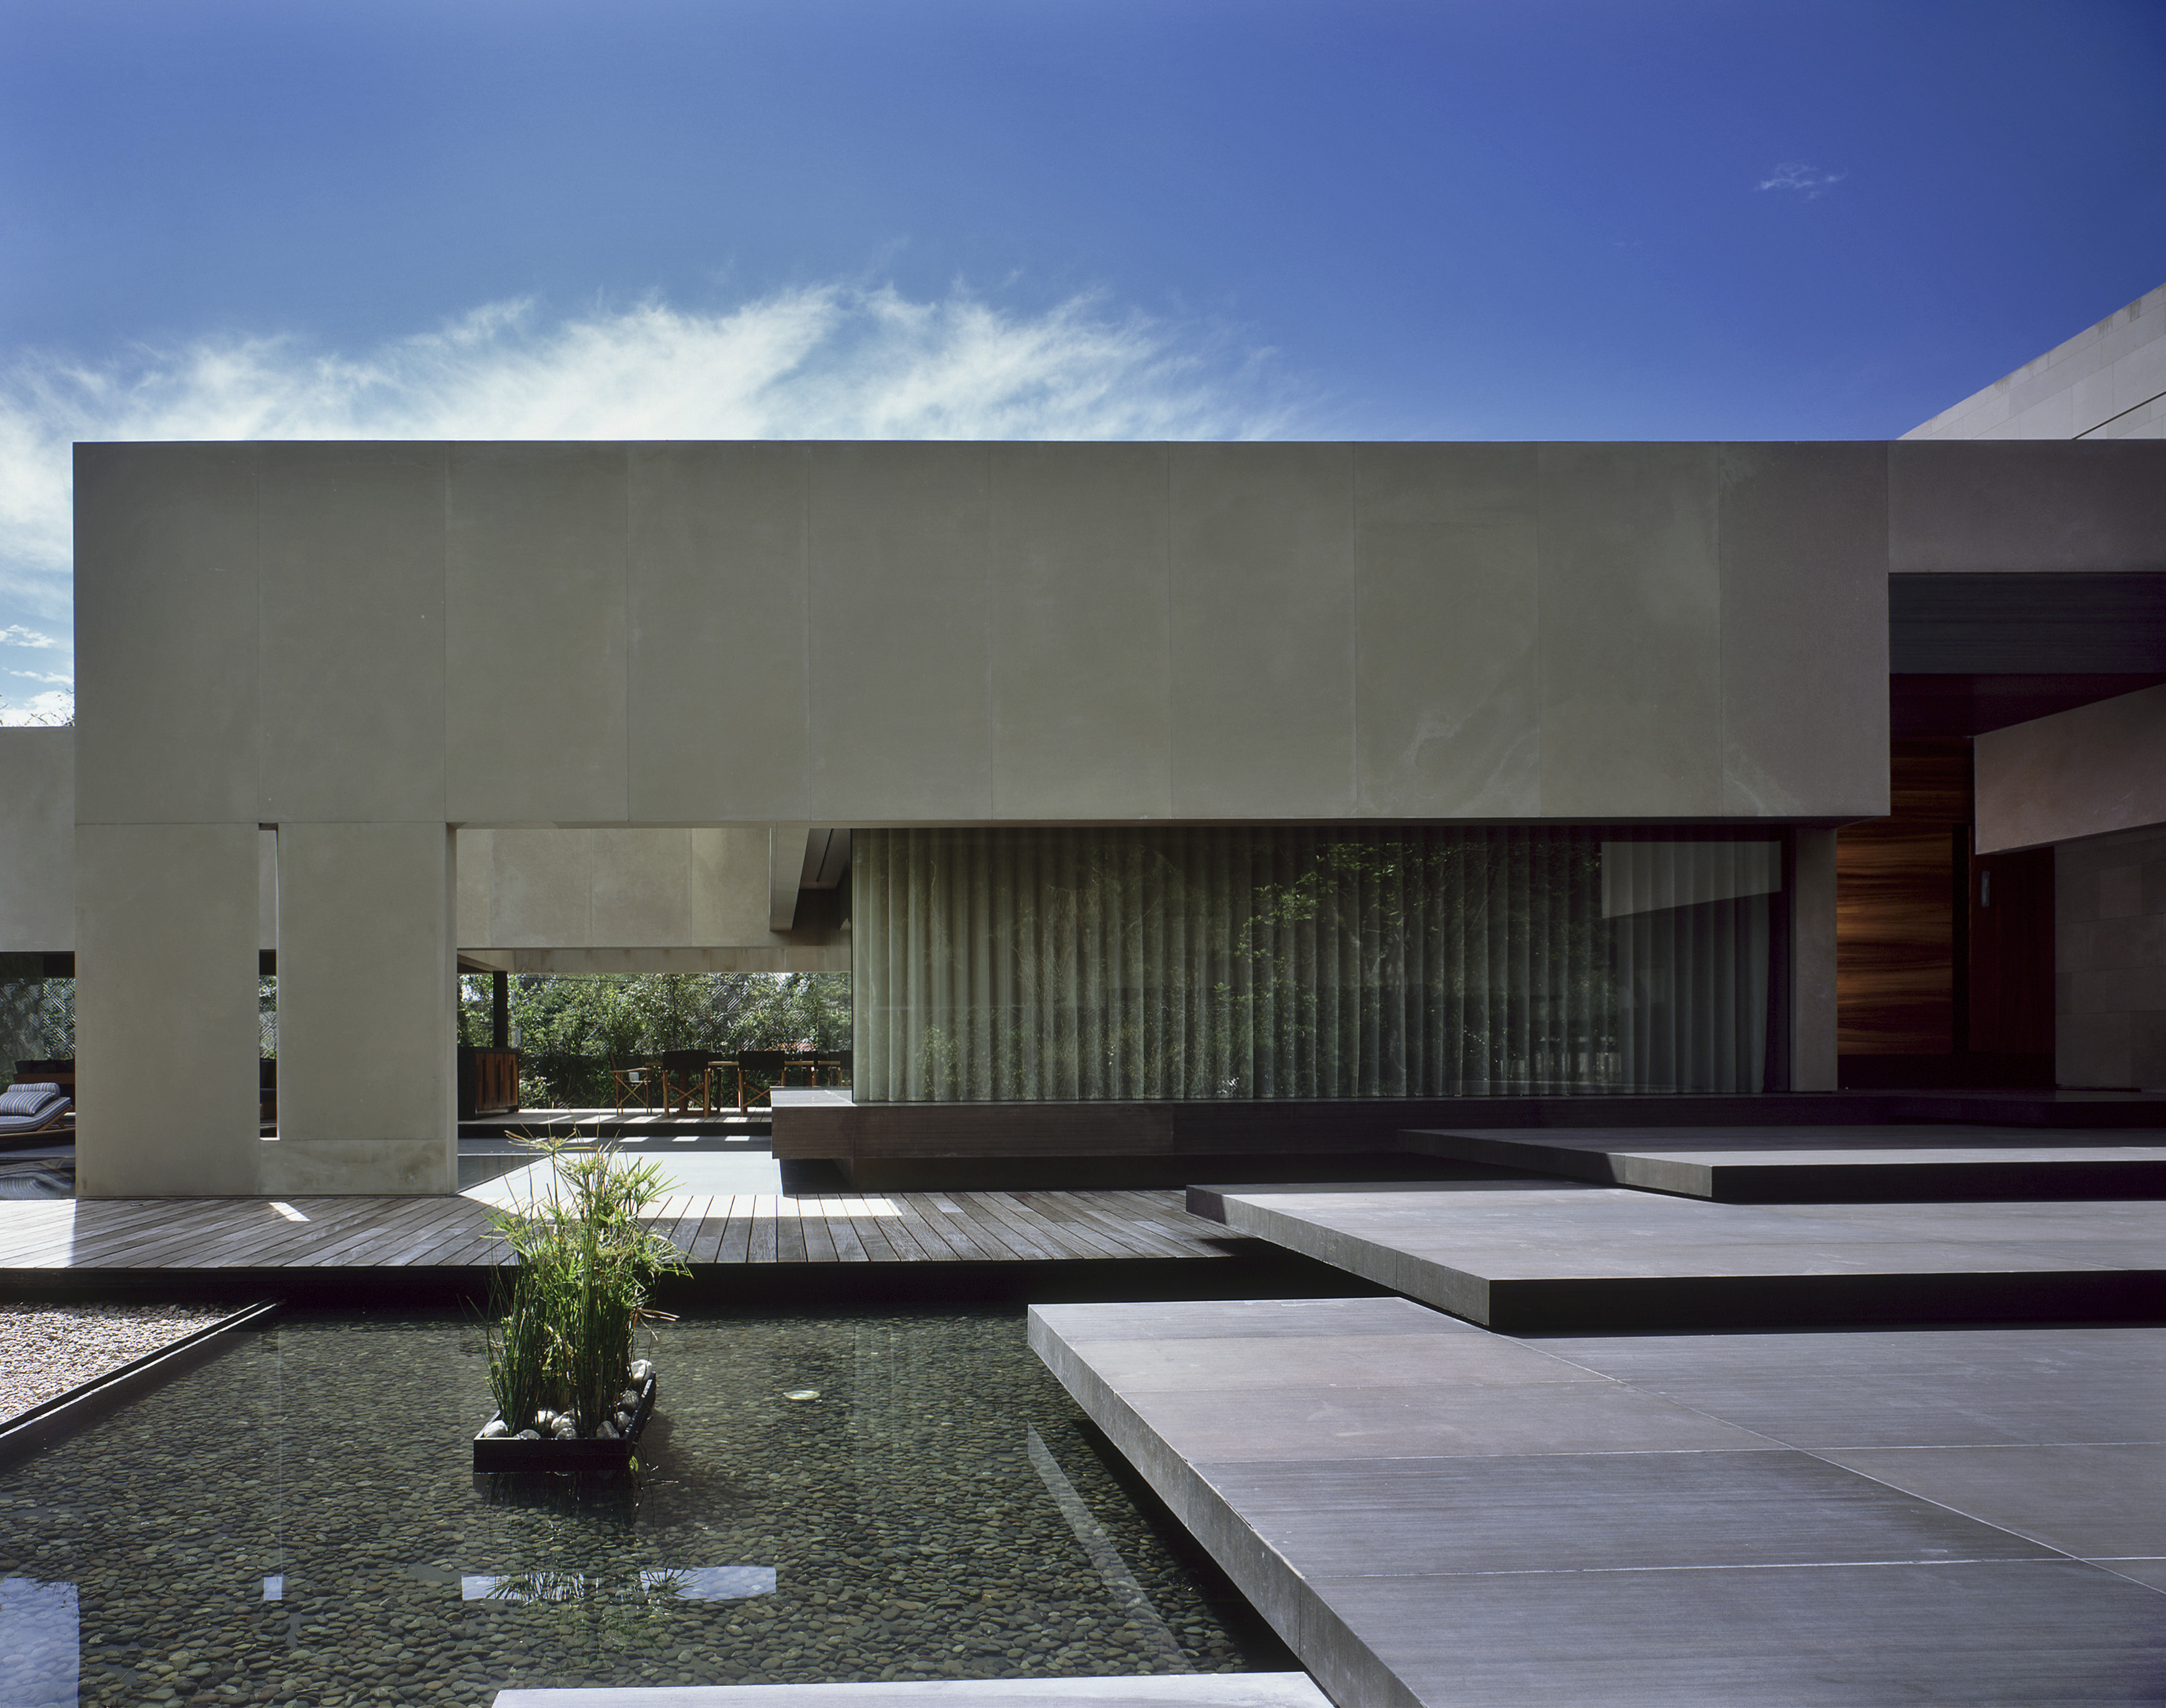 Casa Reforma / Central de Arquitectura, Cortesia Central de Arquitectura